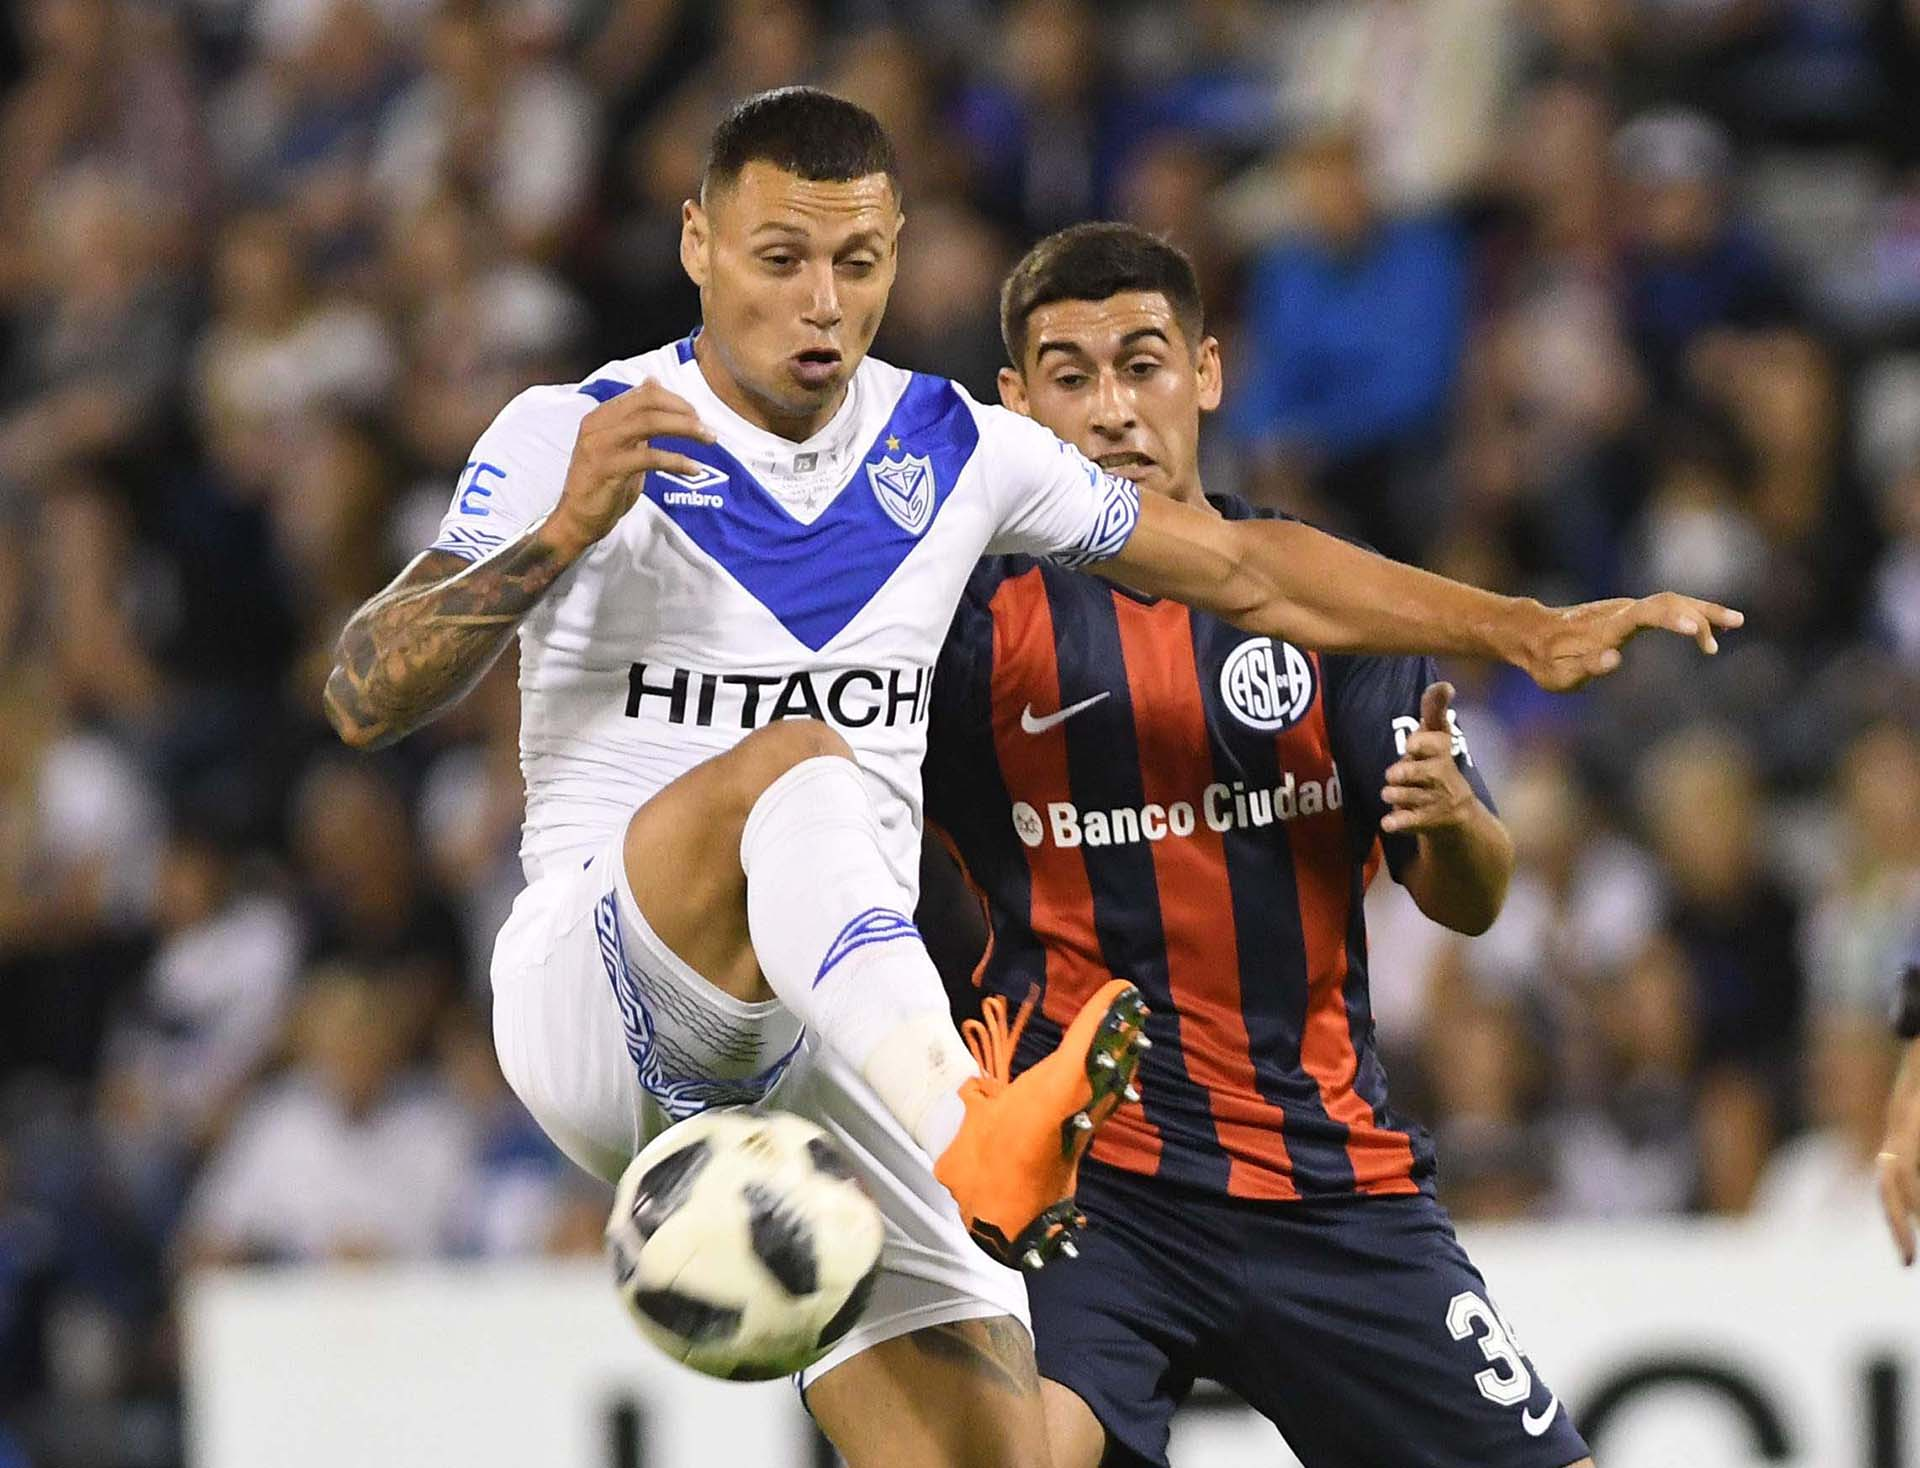 Velez enfrenta a San Lorenzo en la Superliga (Télam)